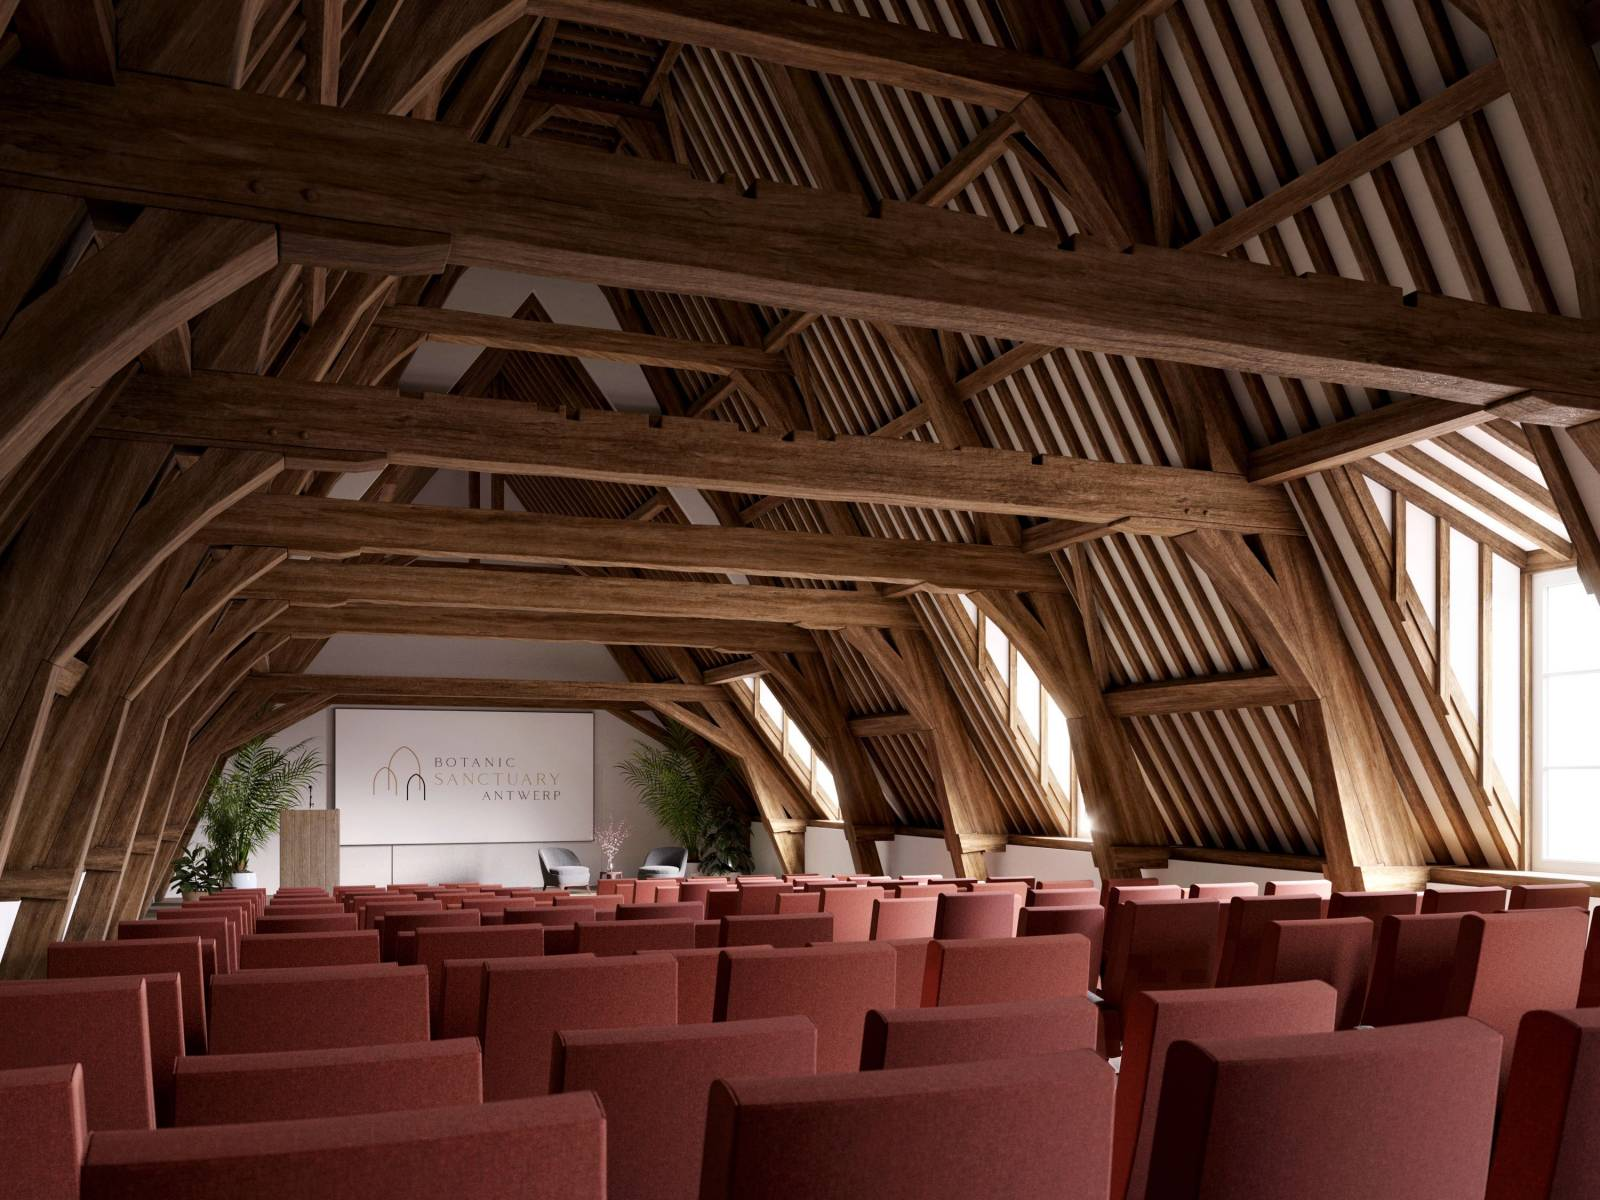 Botanic Sanctuary Antwerp - Feestzaal - House of Weddings - 5